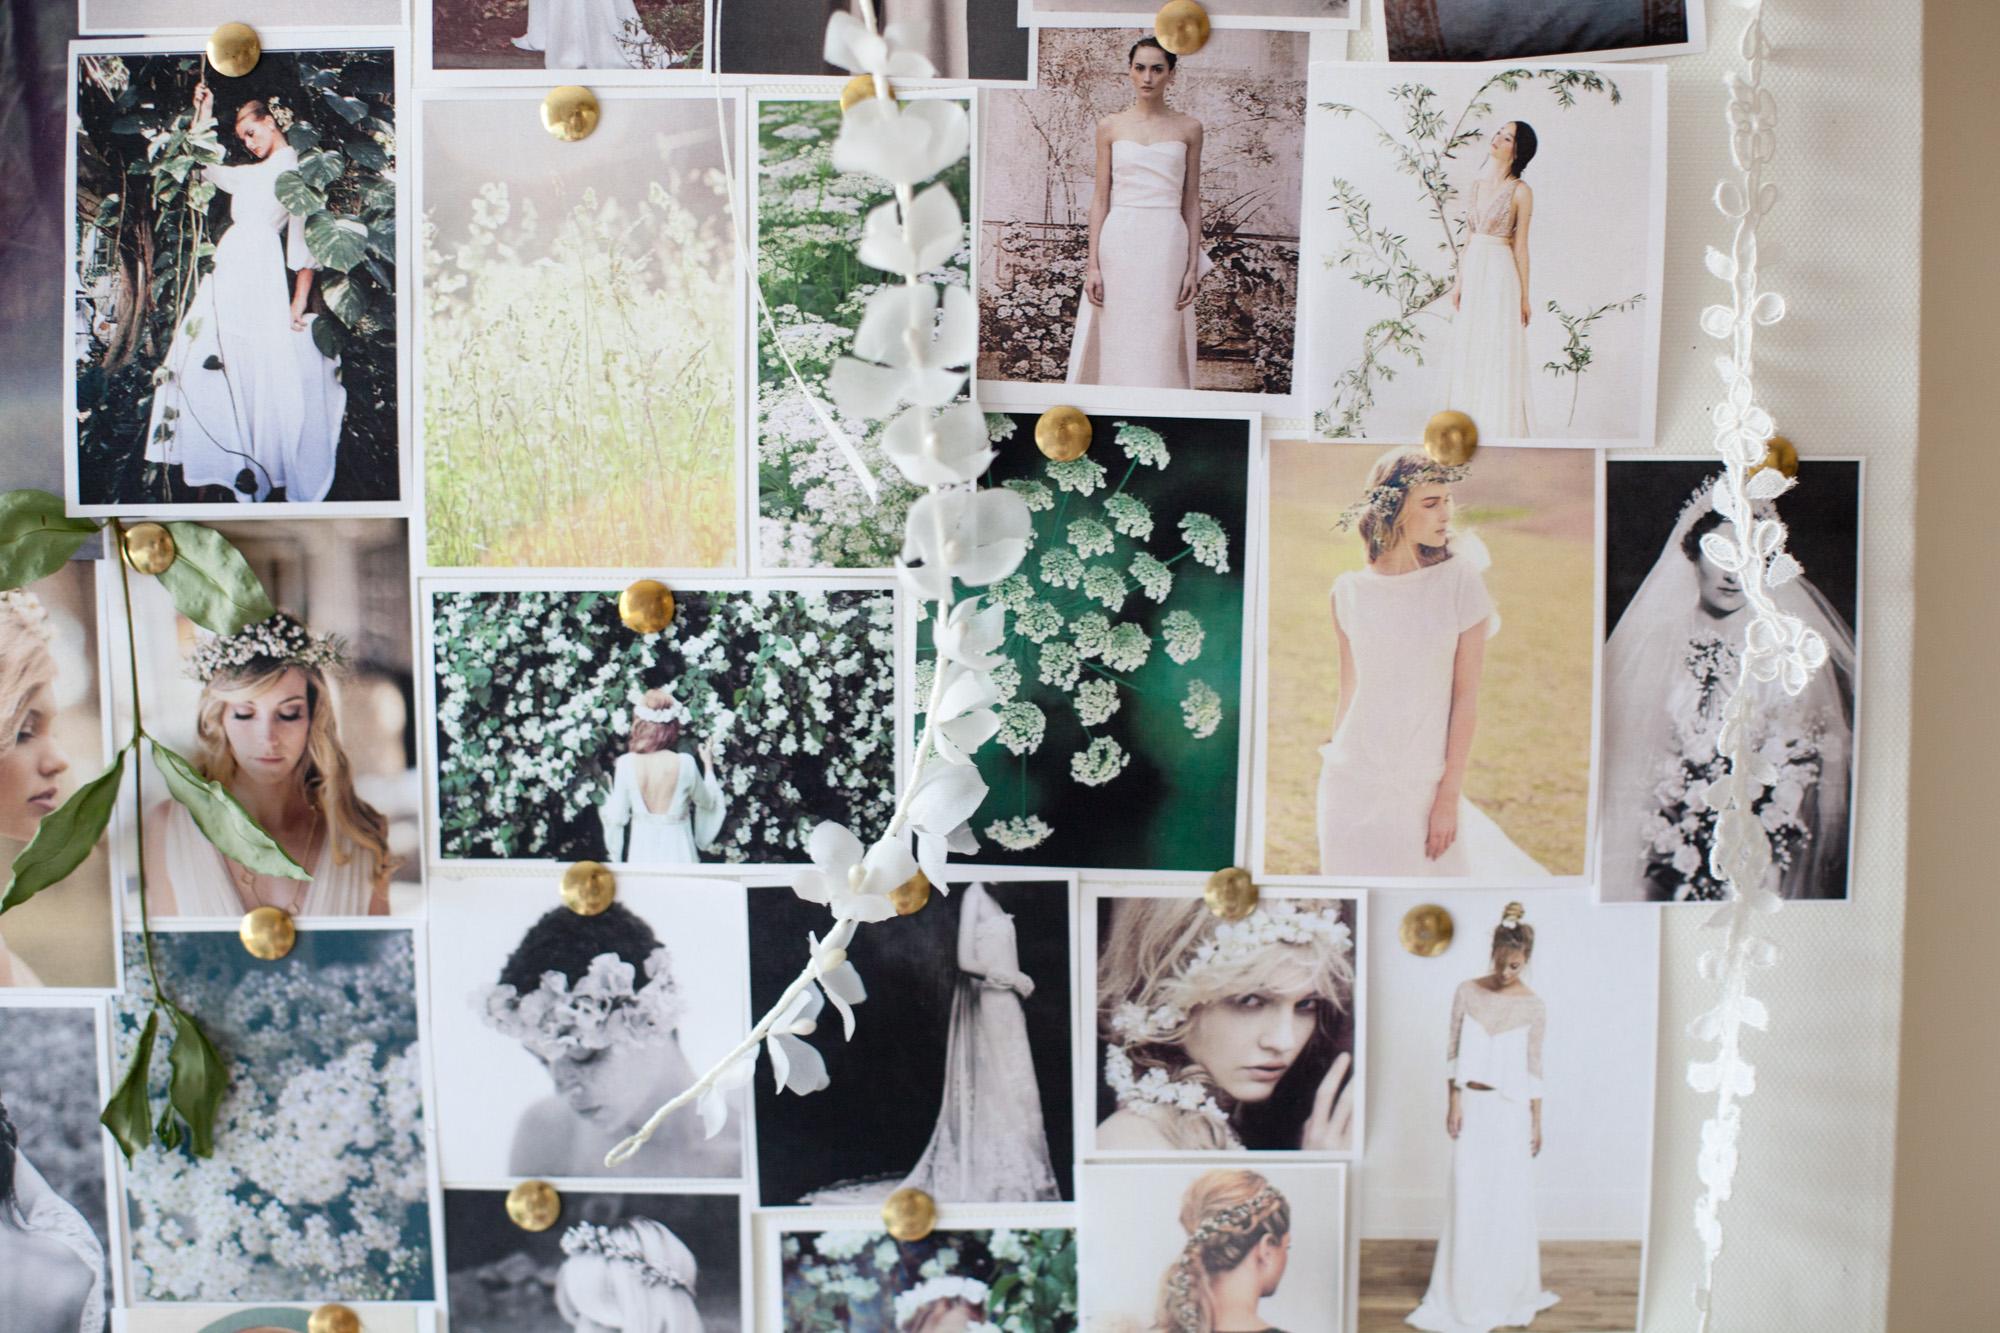 bridal-design-inspiration-mood-board